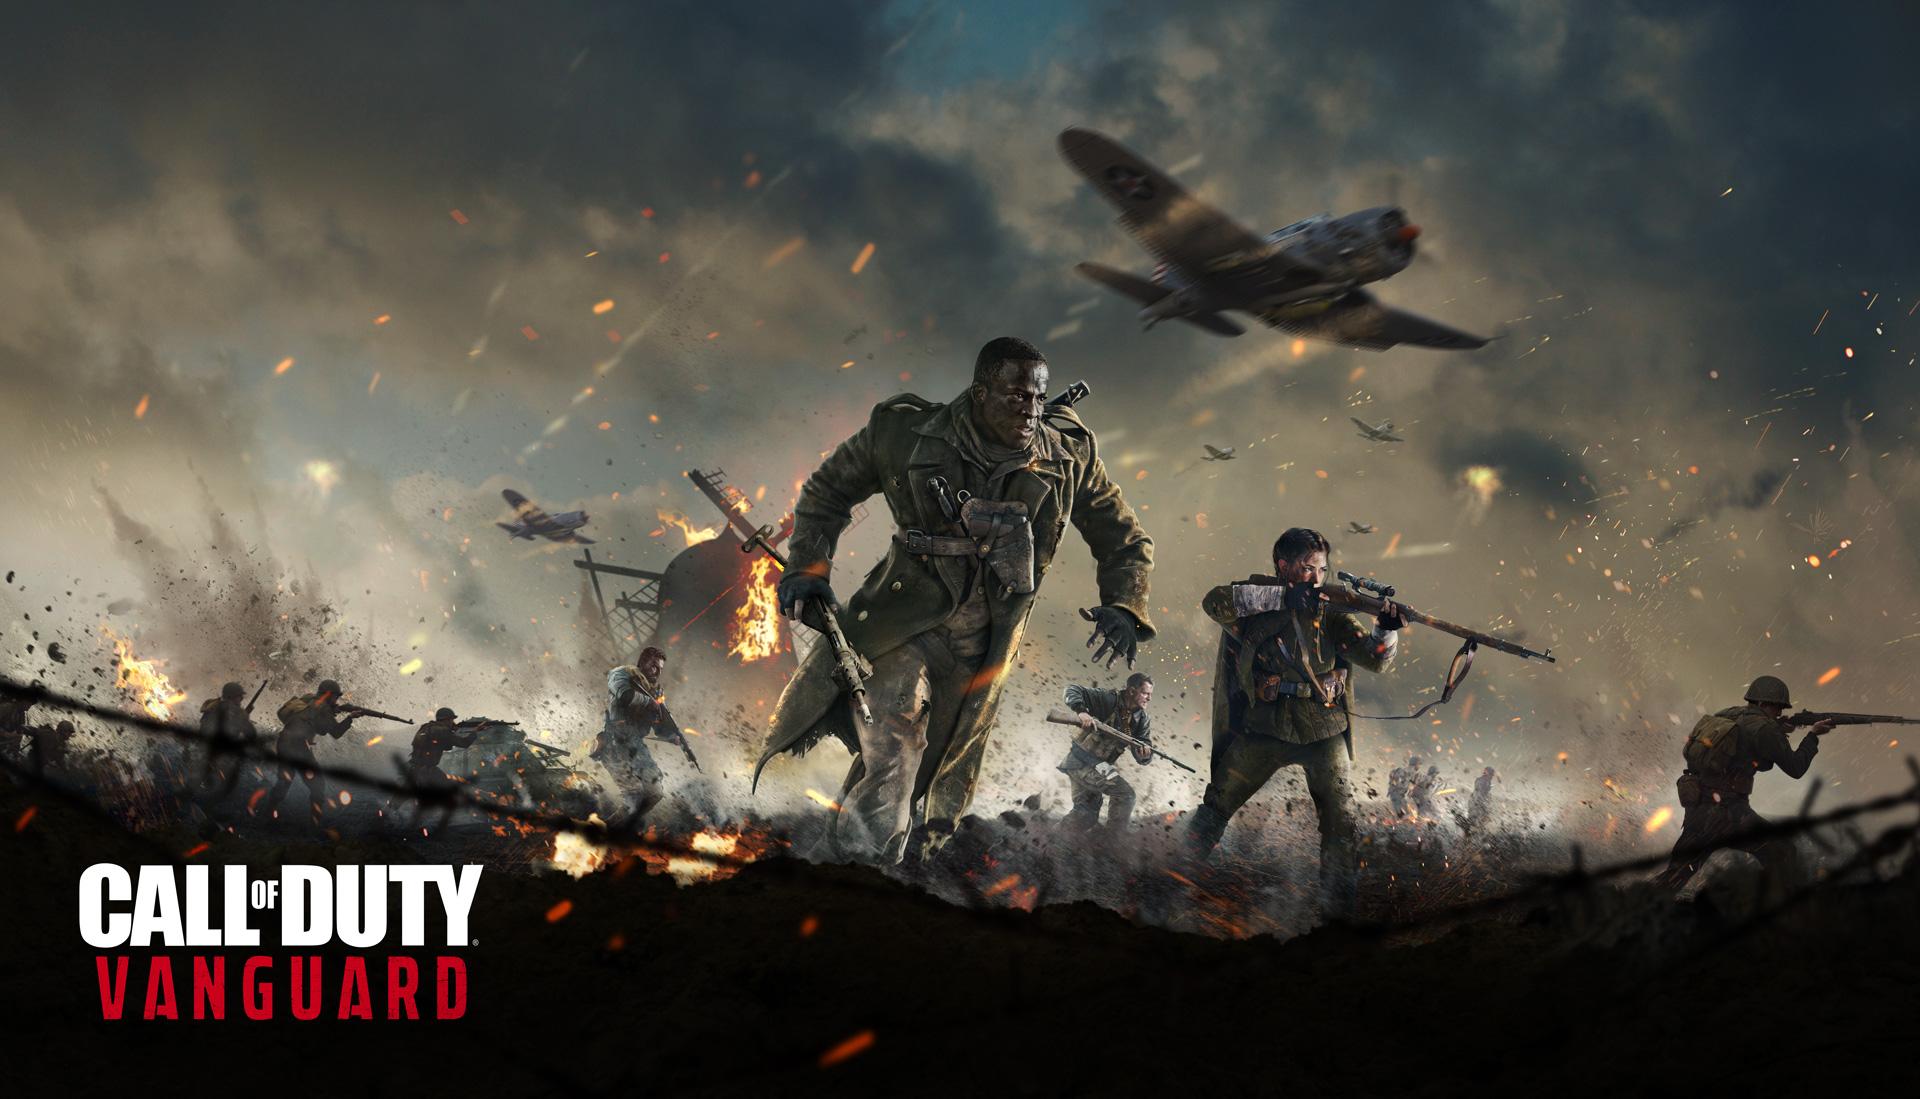 Call of Duty Vanguard 2382021 2